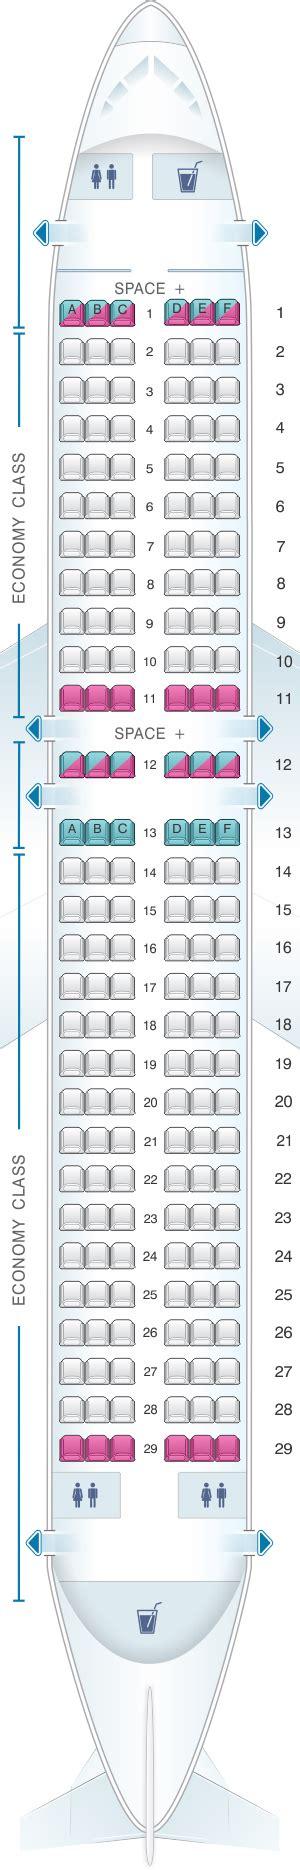 boeing 737 300 plan si鑒es seat map latam airlines brasil airbus a320 174pax seatmaestro